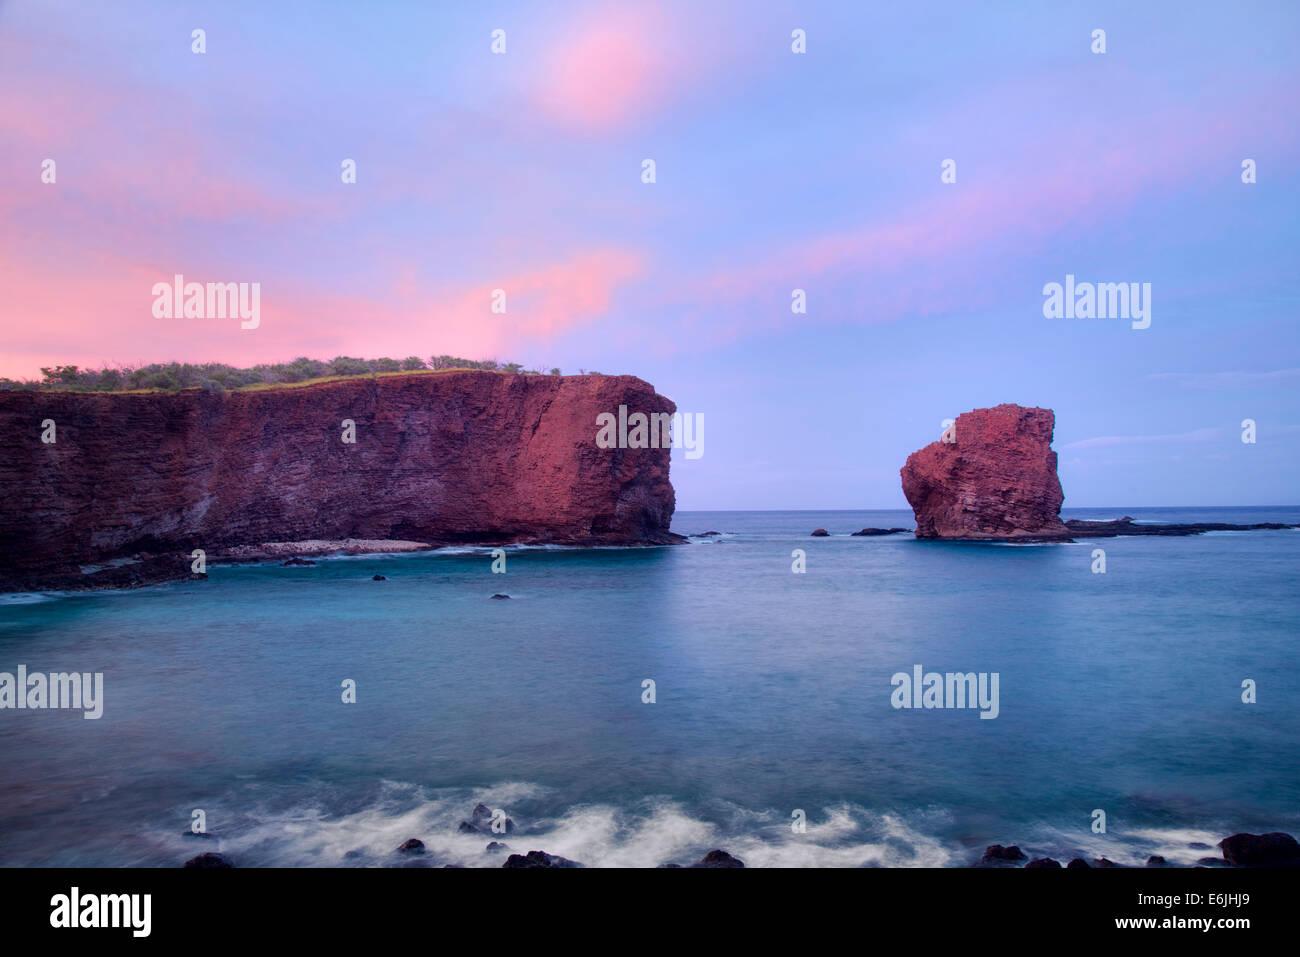 Sweetheart Rock at sunset. Lanai, Hawaii - Stock Image